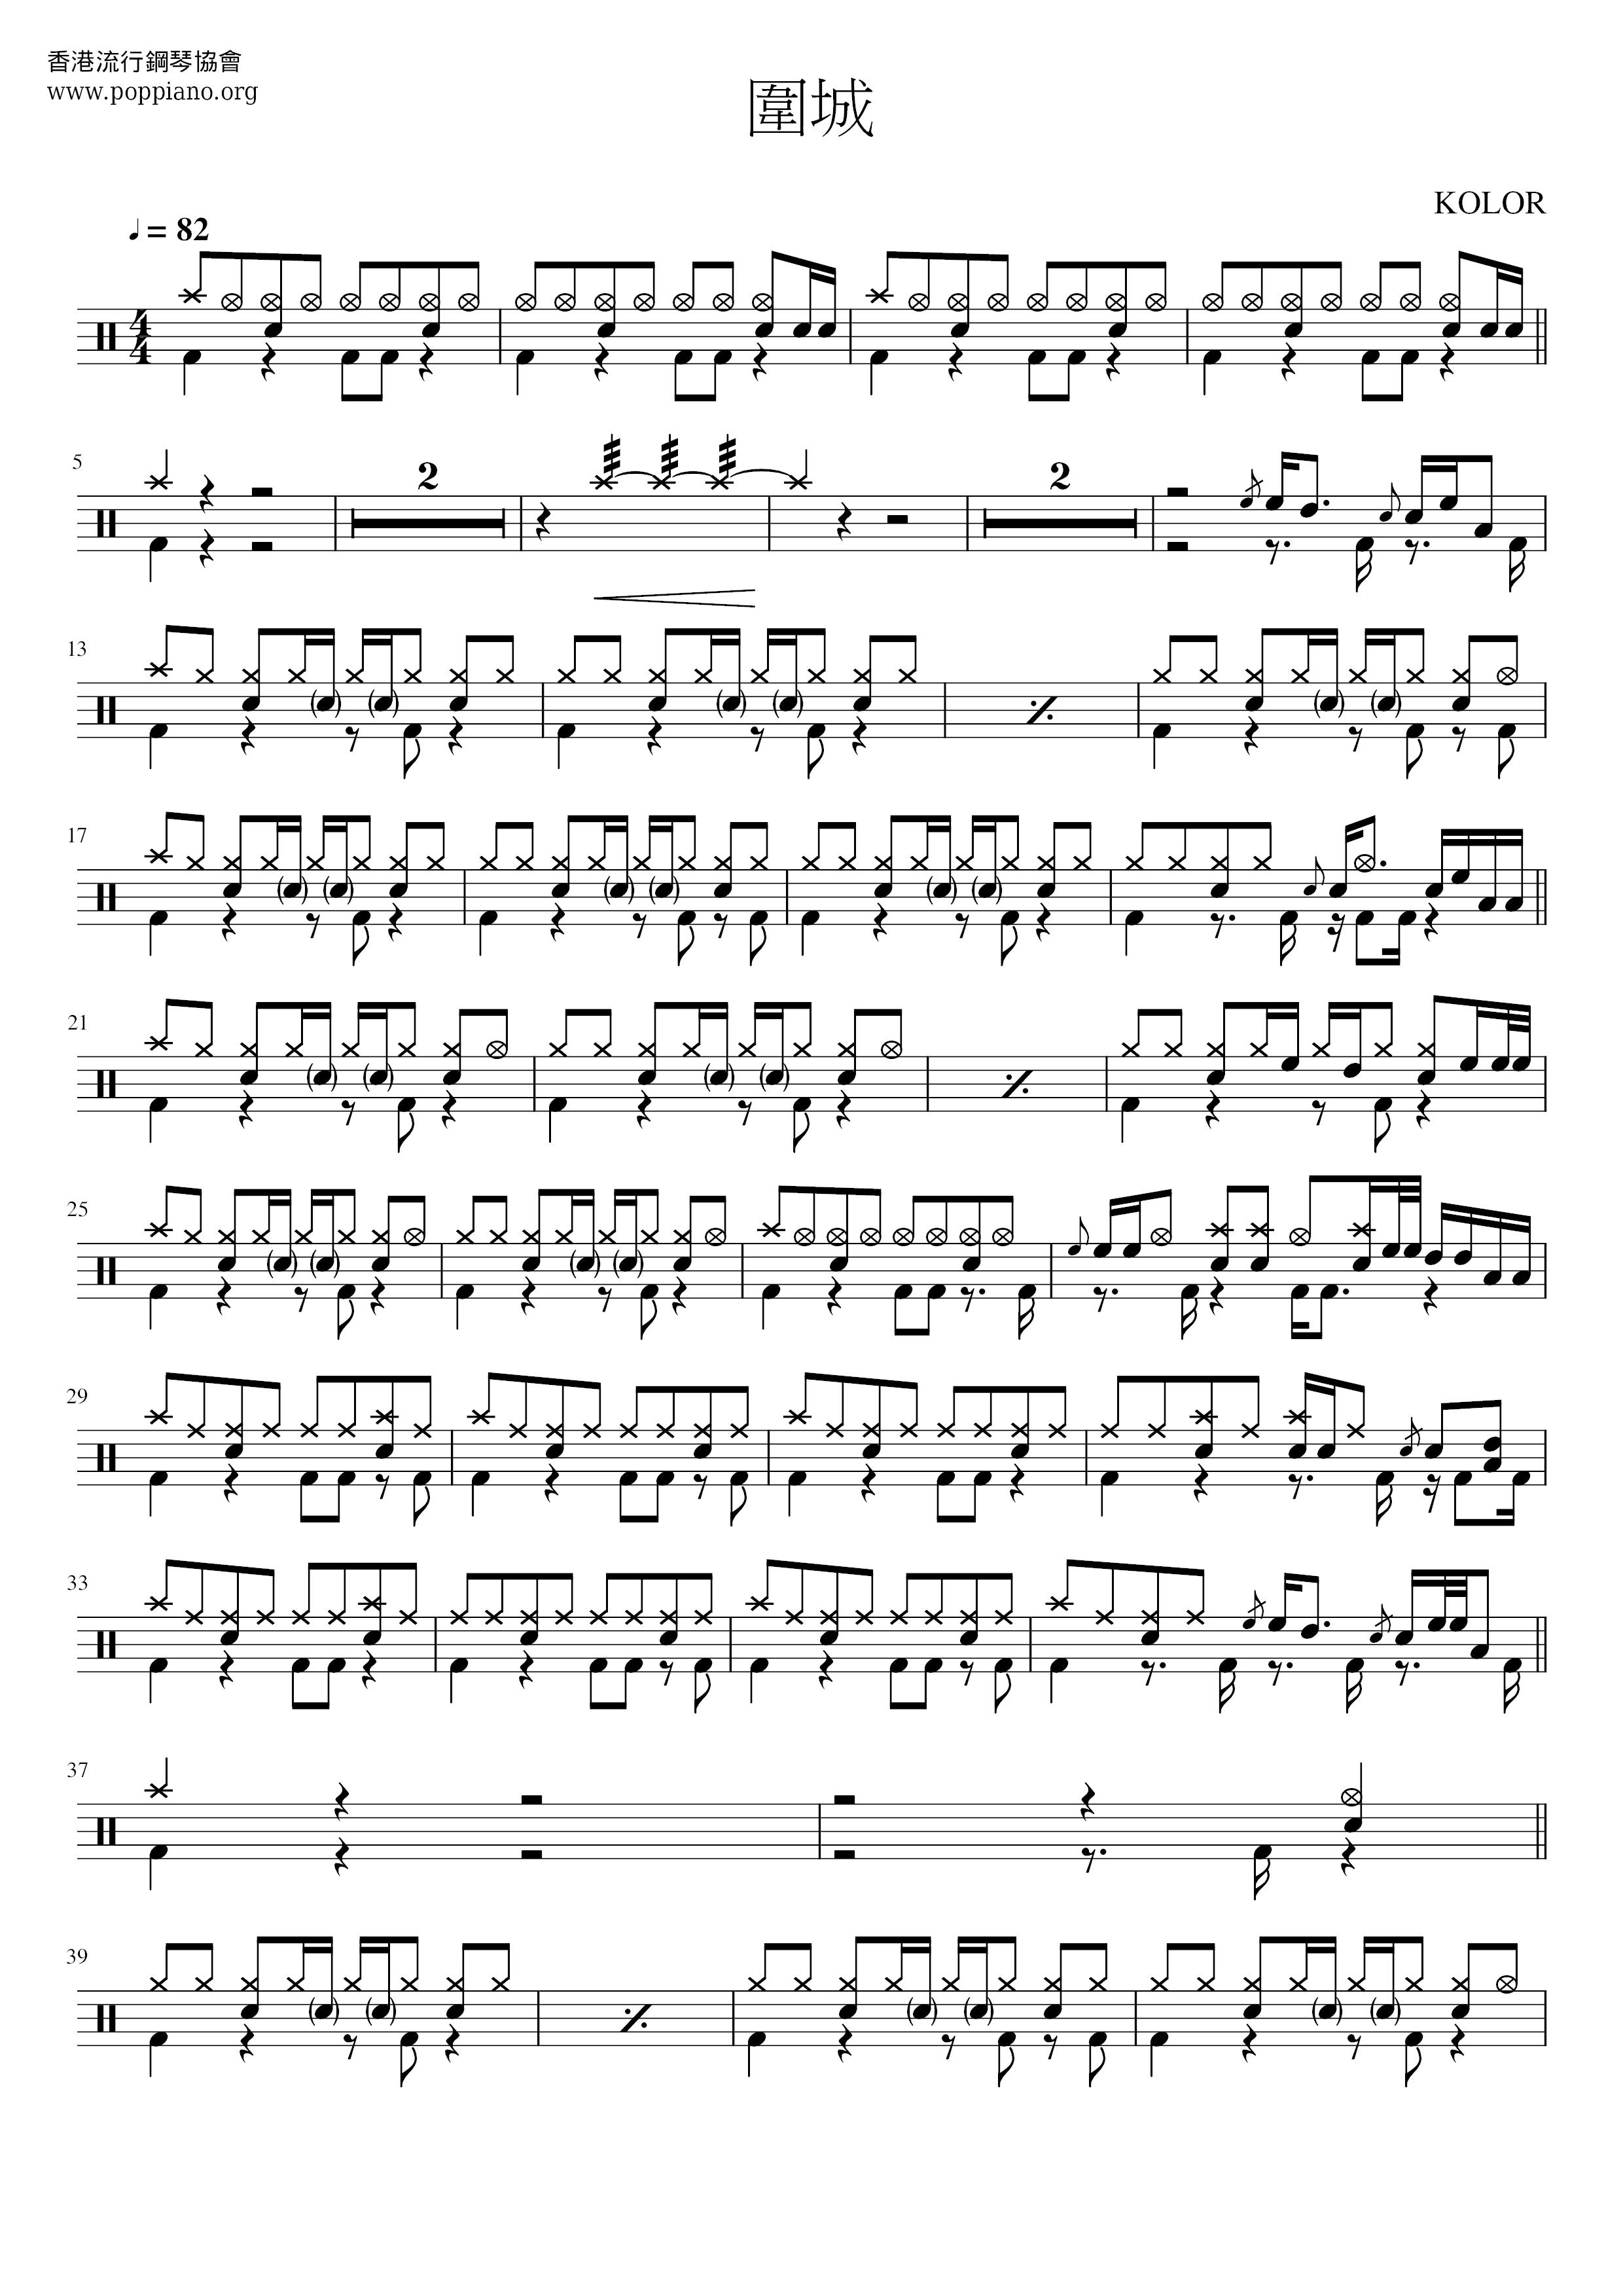 ★ Kolor-圍城 鼓譜pdf-香港流行鋼琴協會琴譜下載 ★